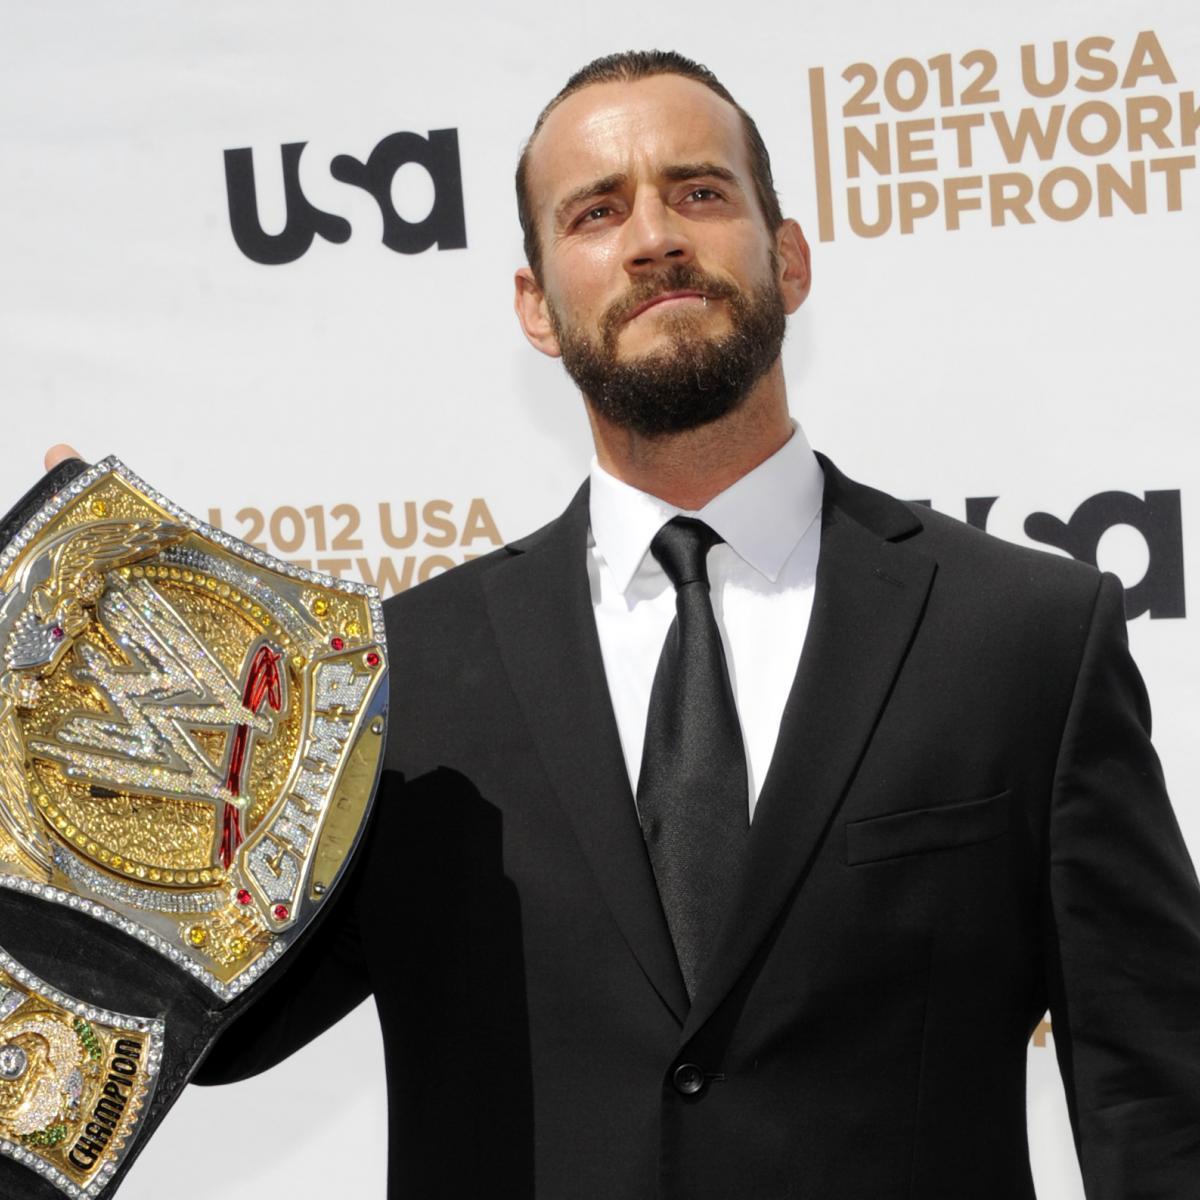 Fantasy Booking CM Punk as 2020 Royal Rumble Winner and ...